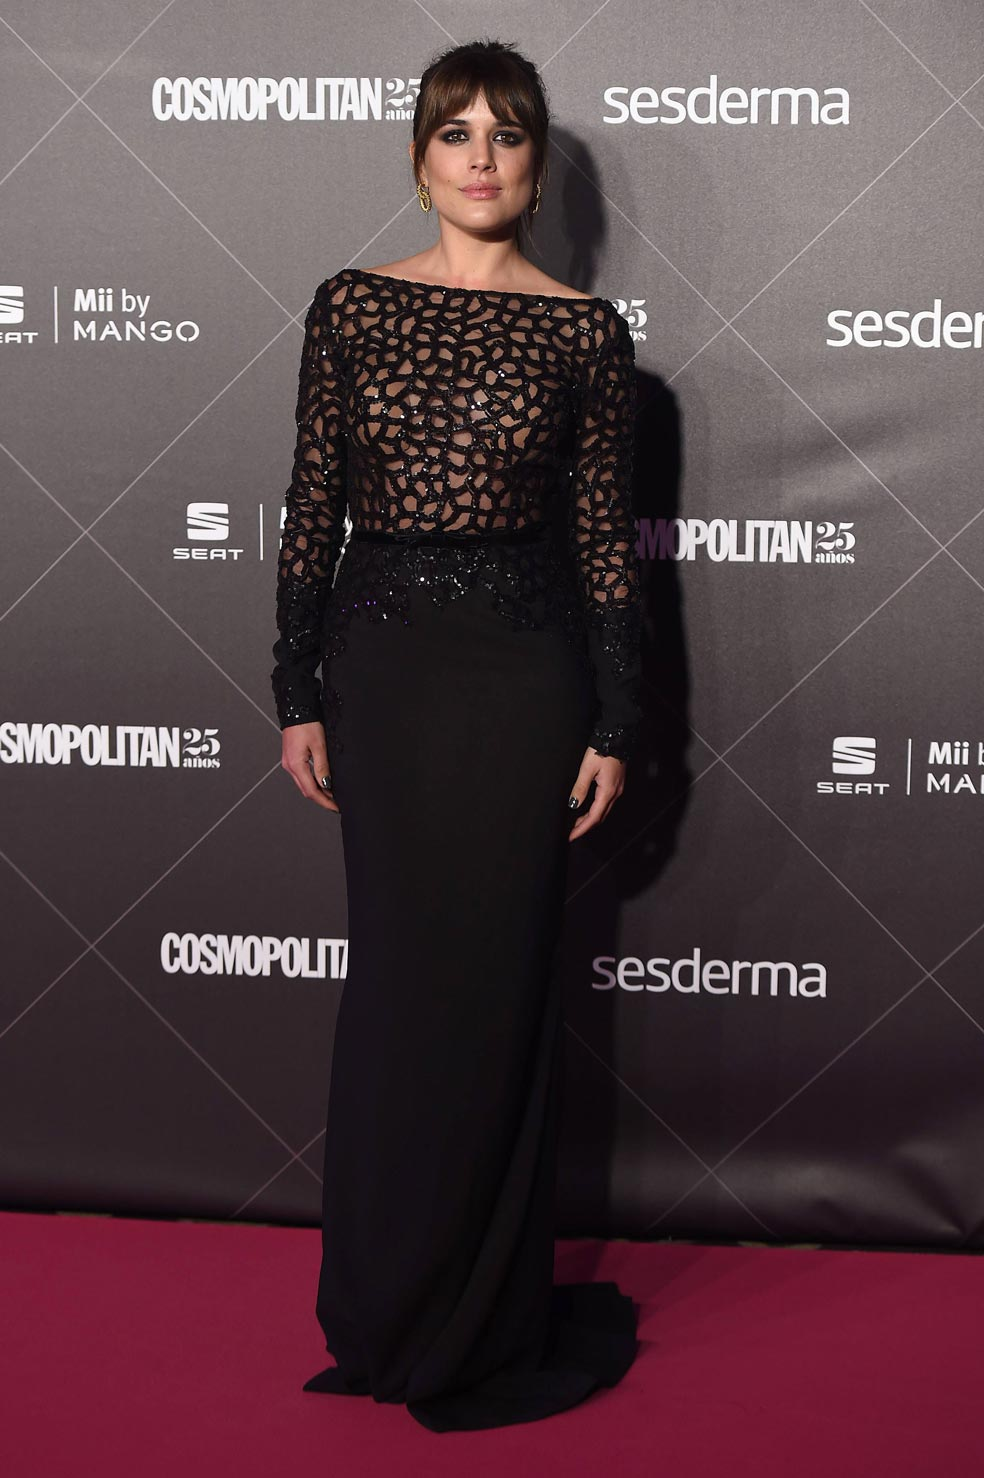 Adriana Ugarte - Premios Cosmopolitan 2015